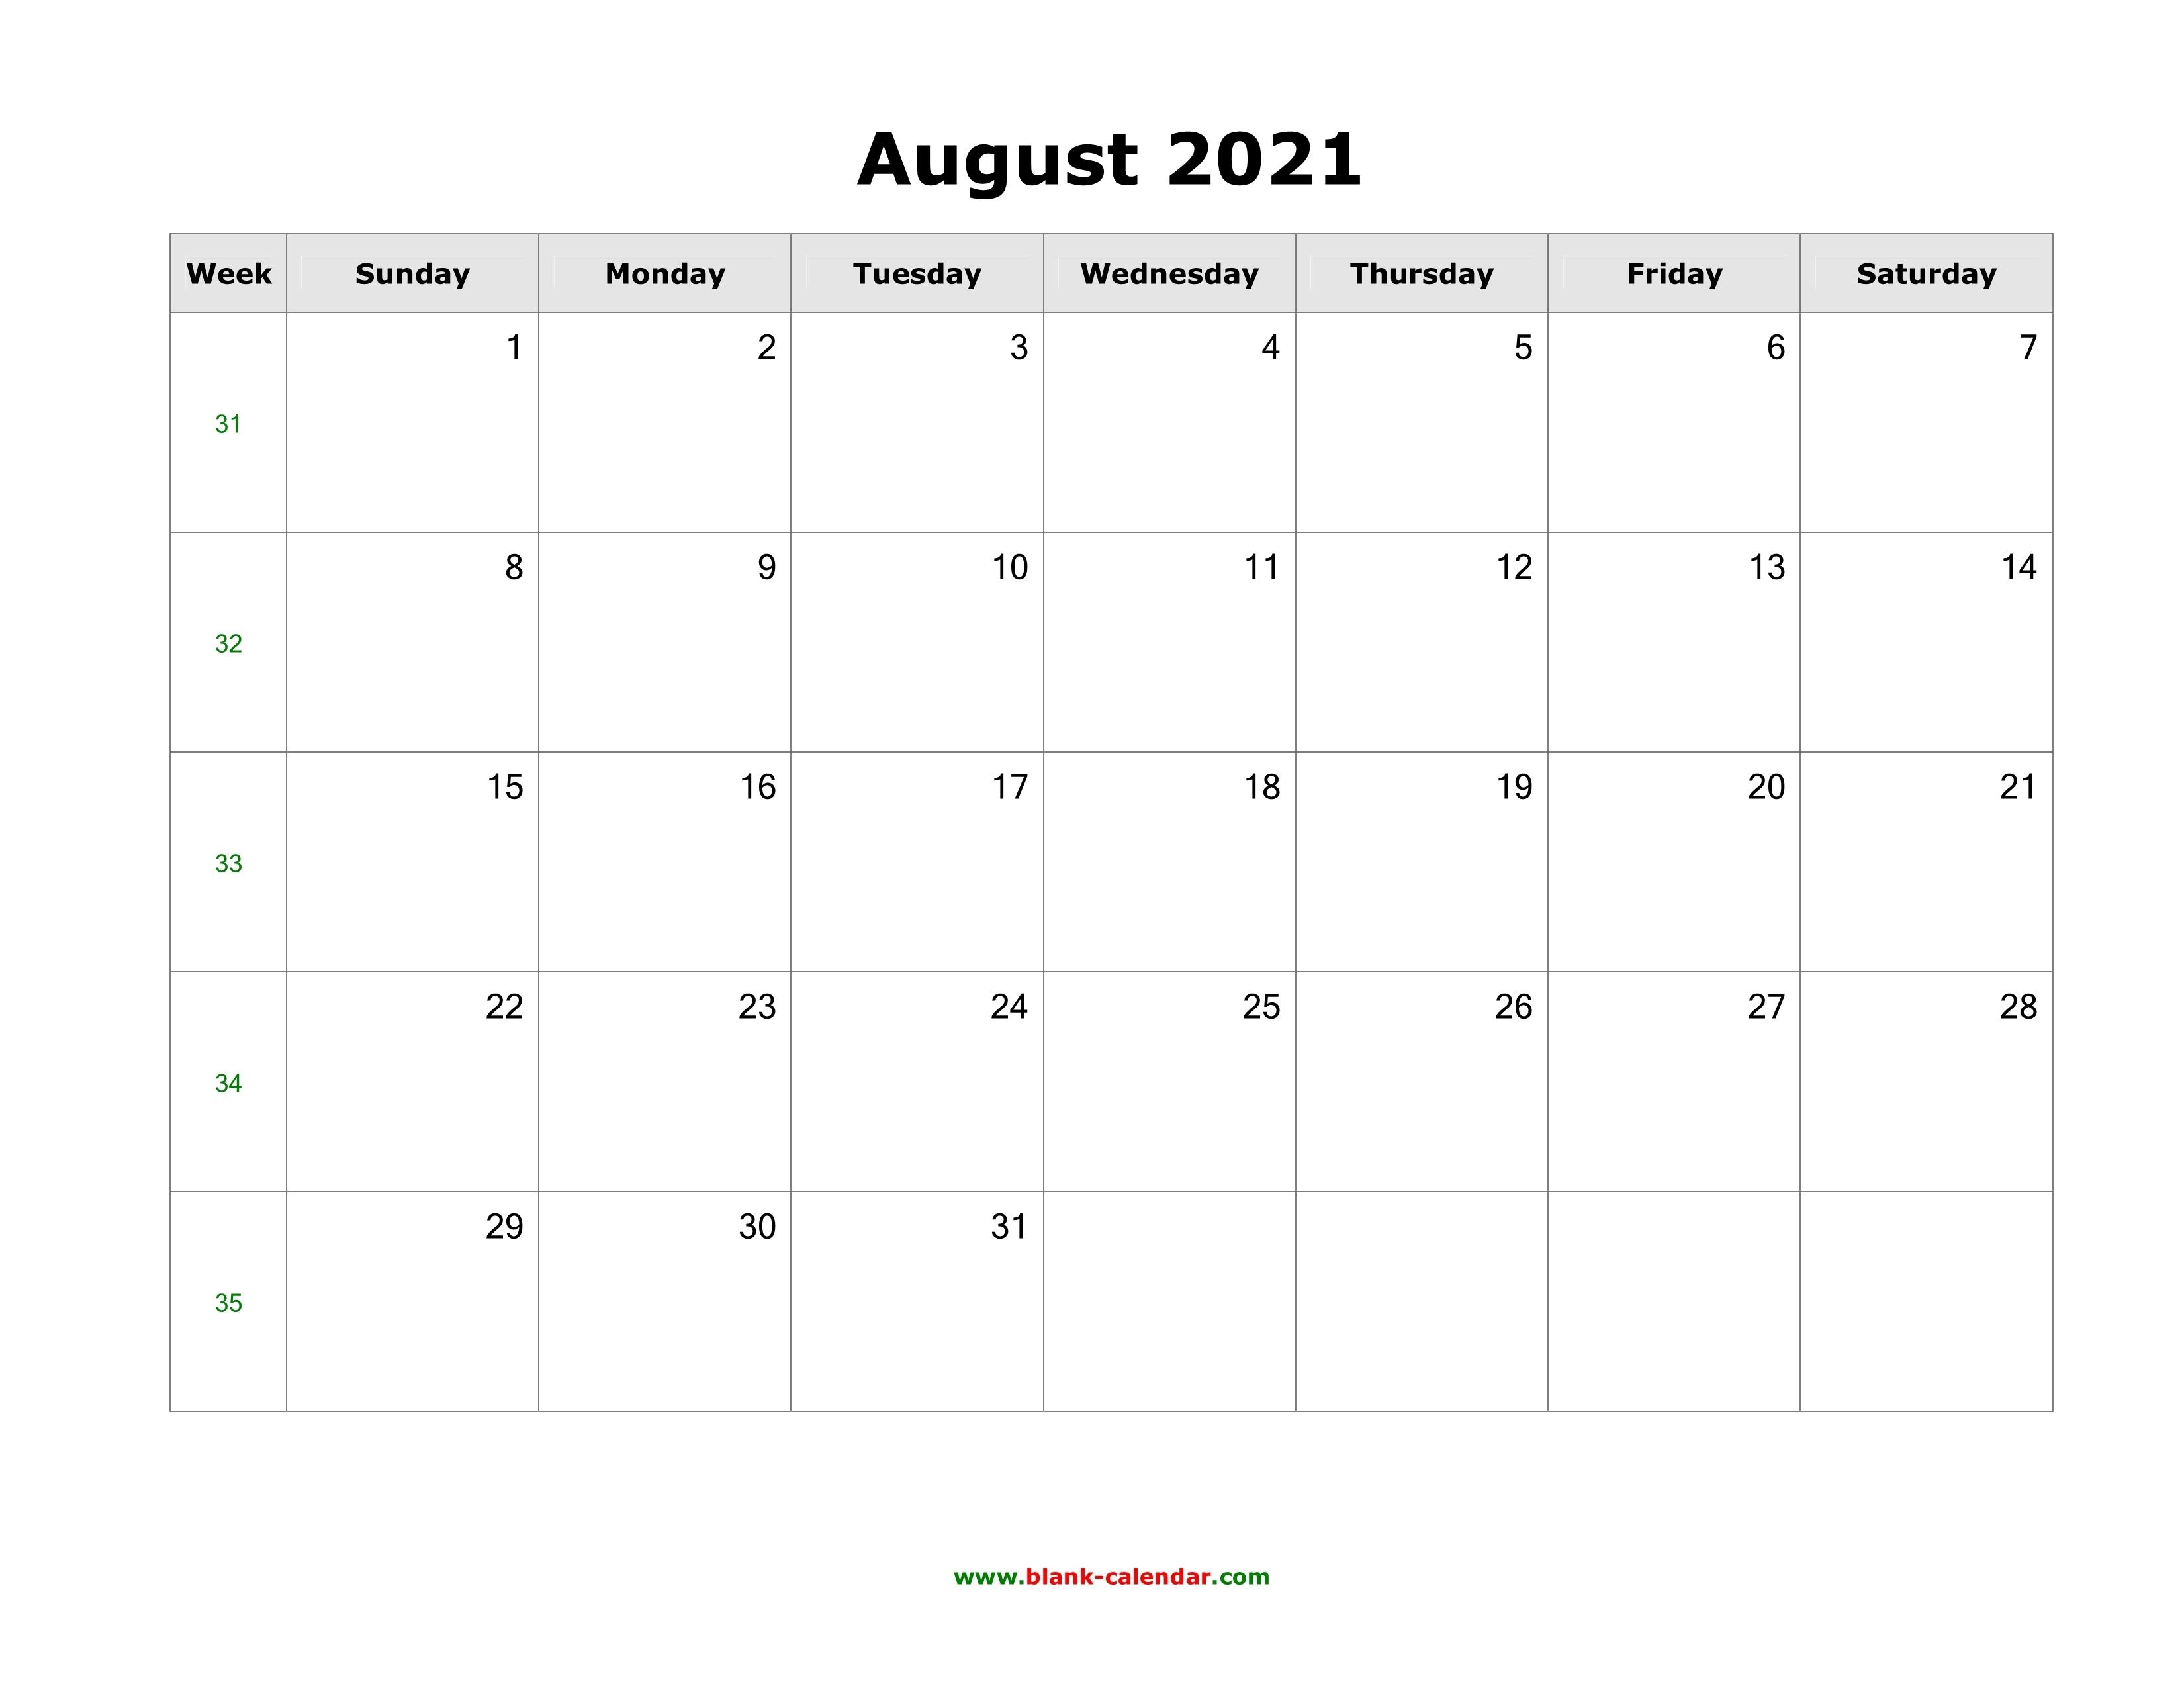 August 2021 Blank Calendar   Free Download Calendar Templates Calendar August 2020 To May 2021